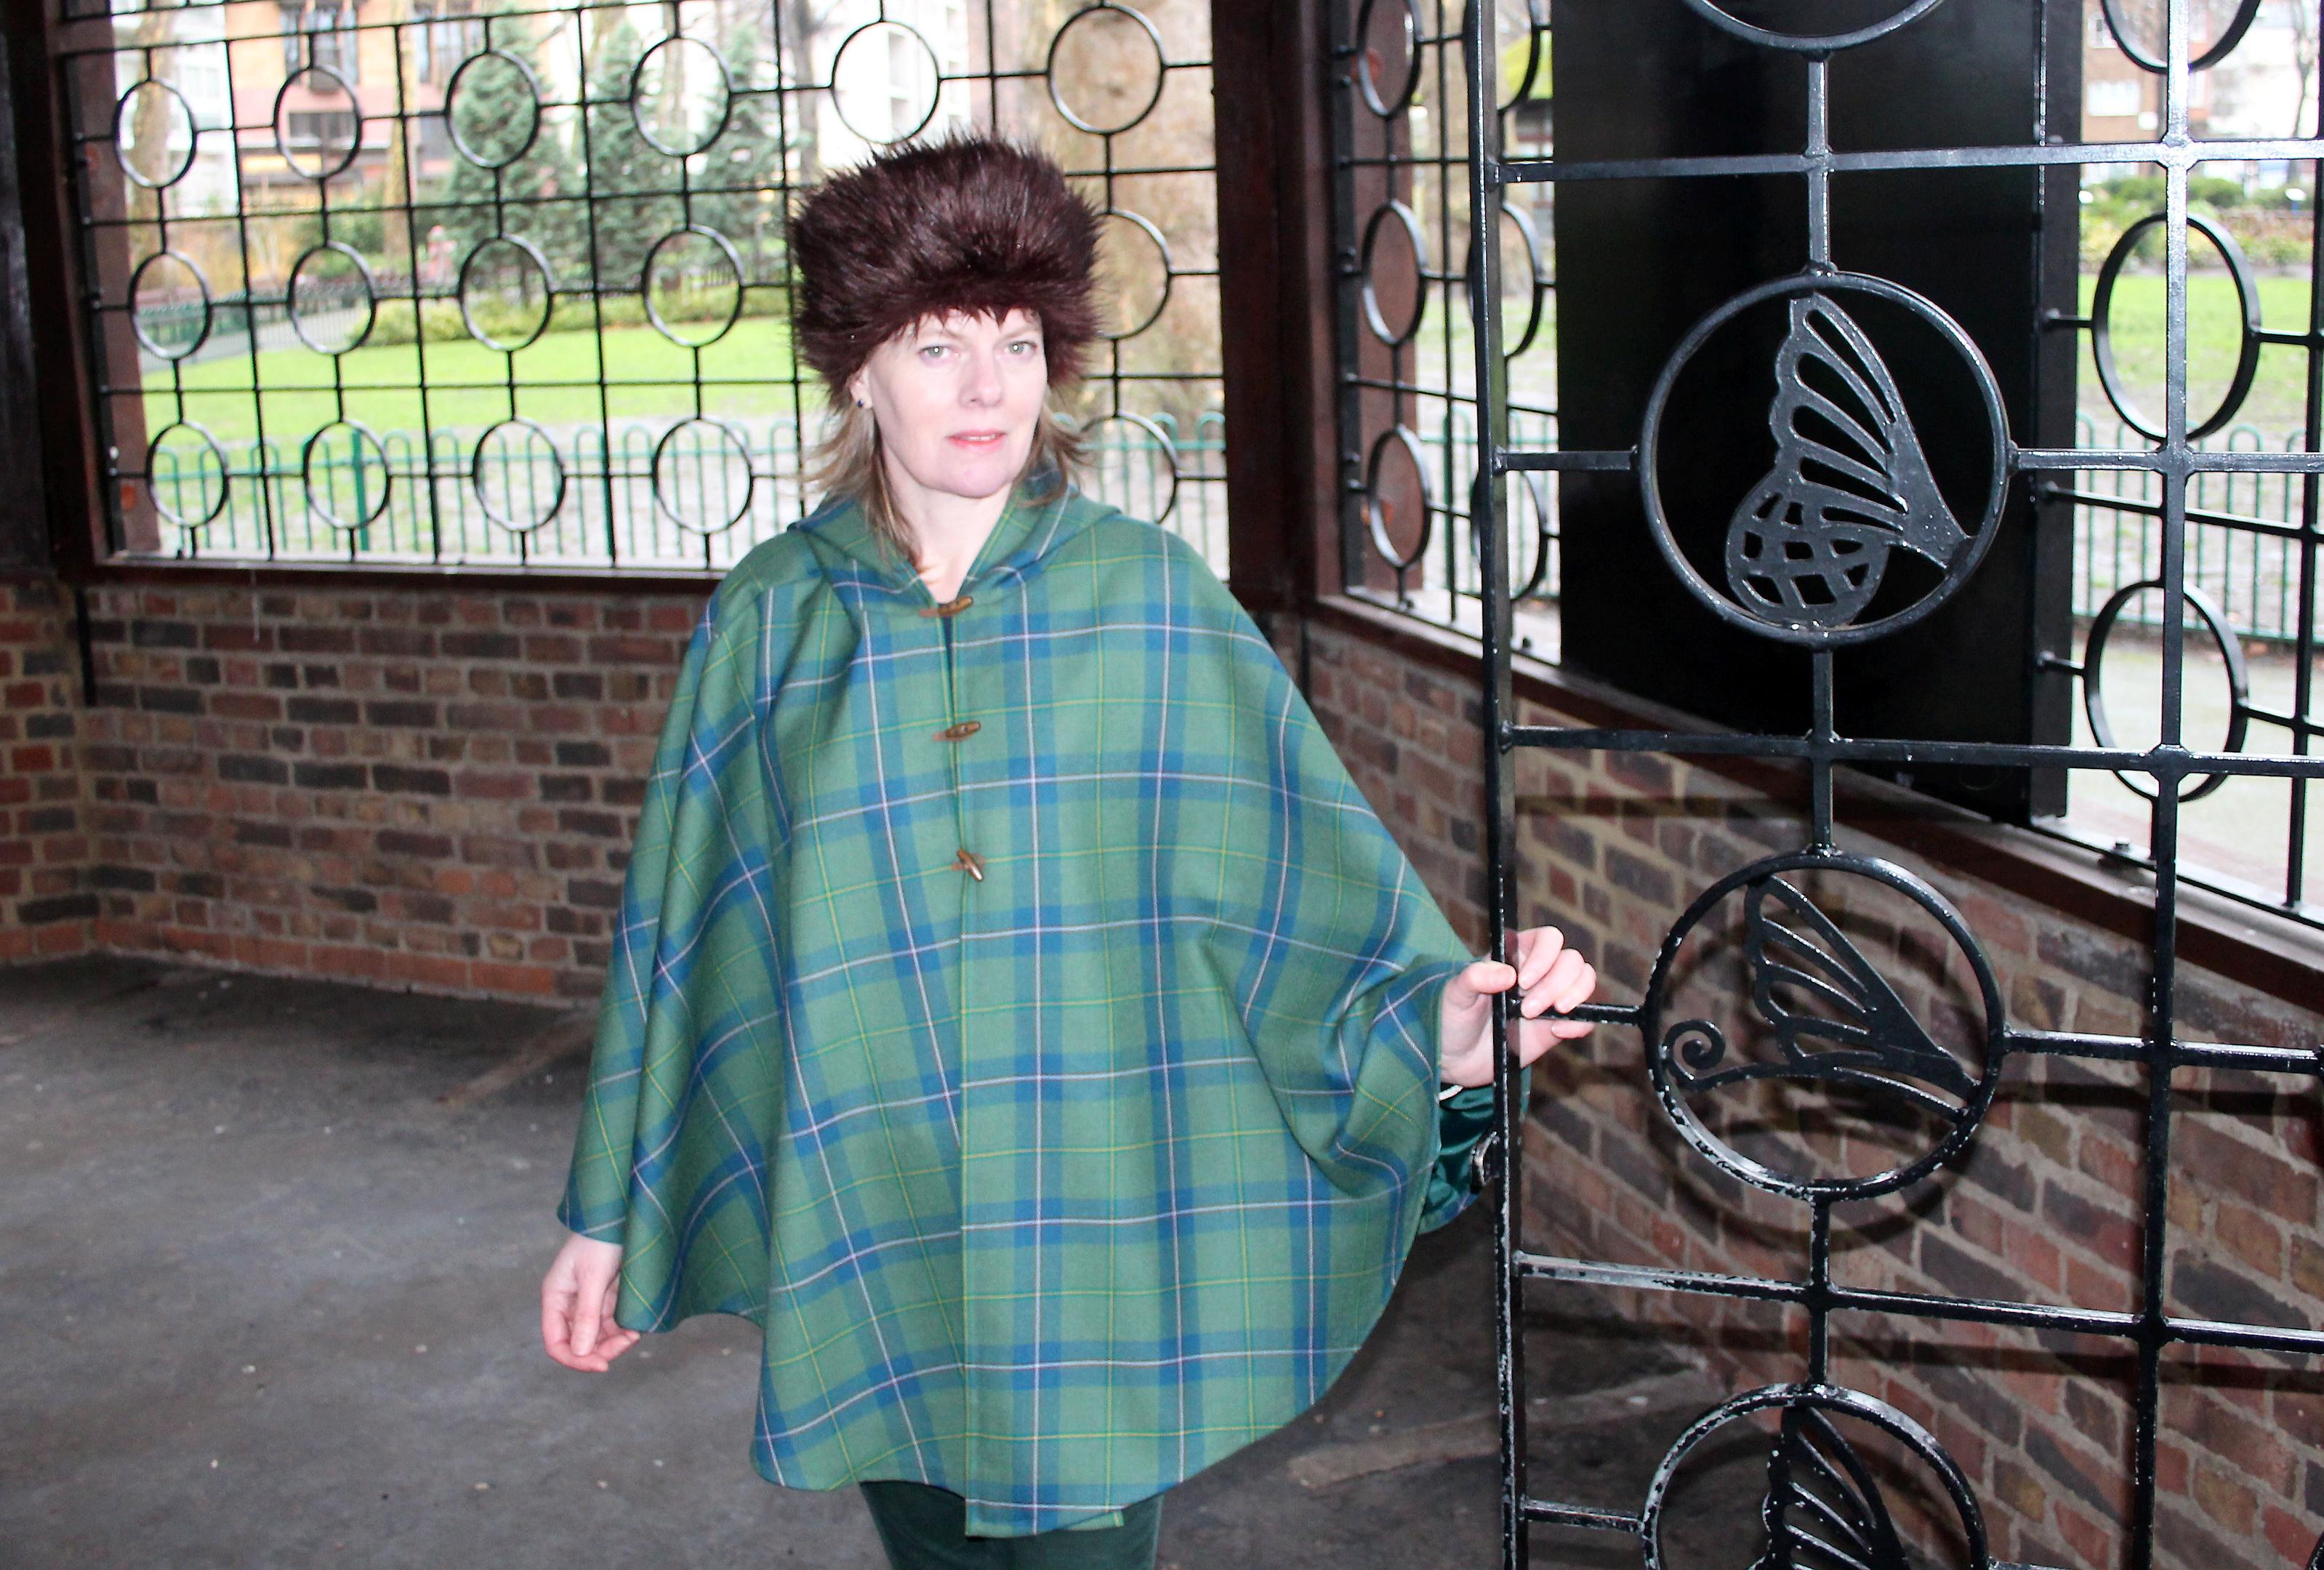 Tania Henzell wearing the tartan.